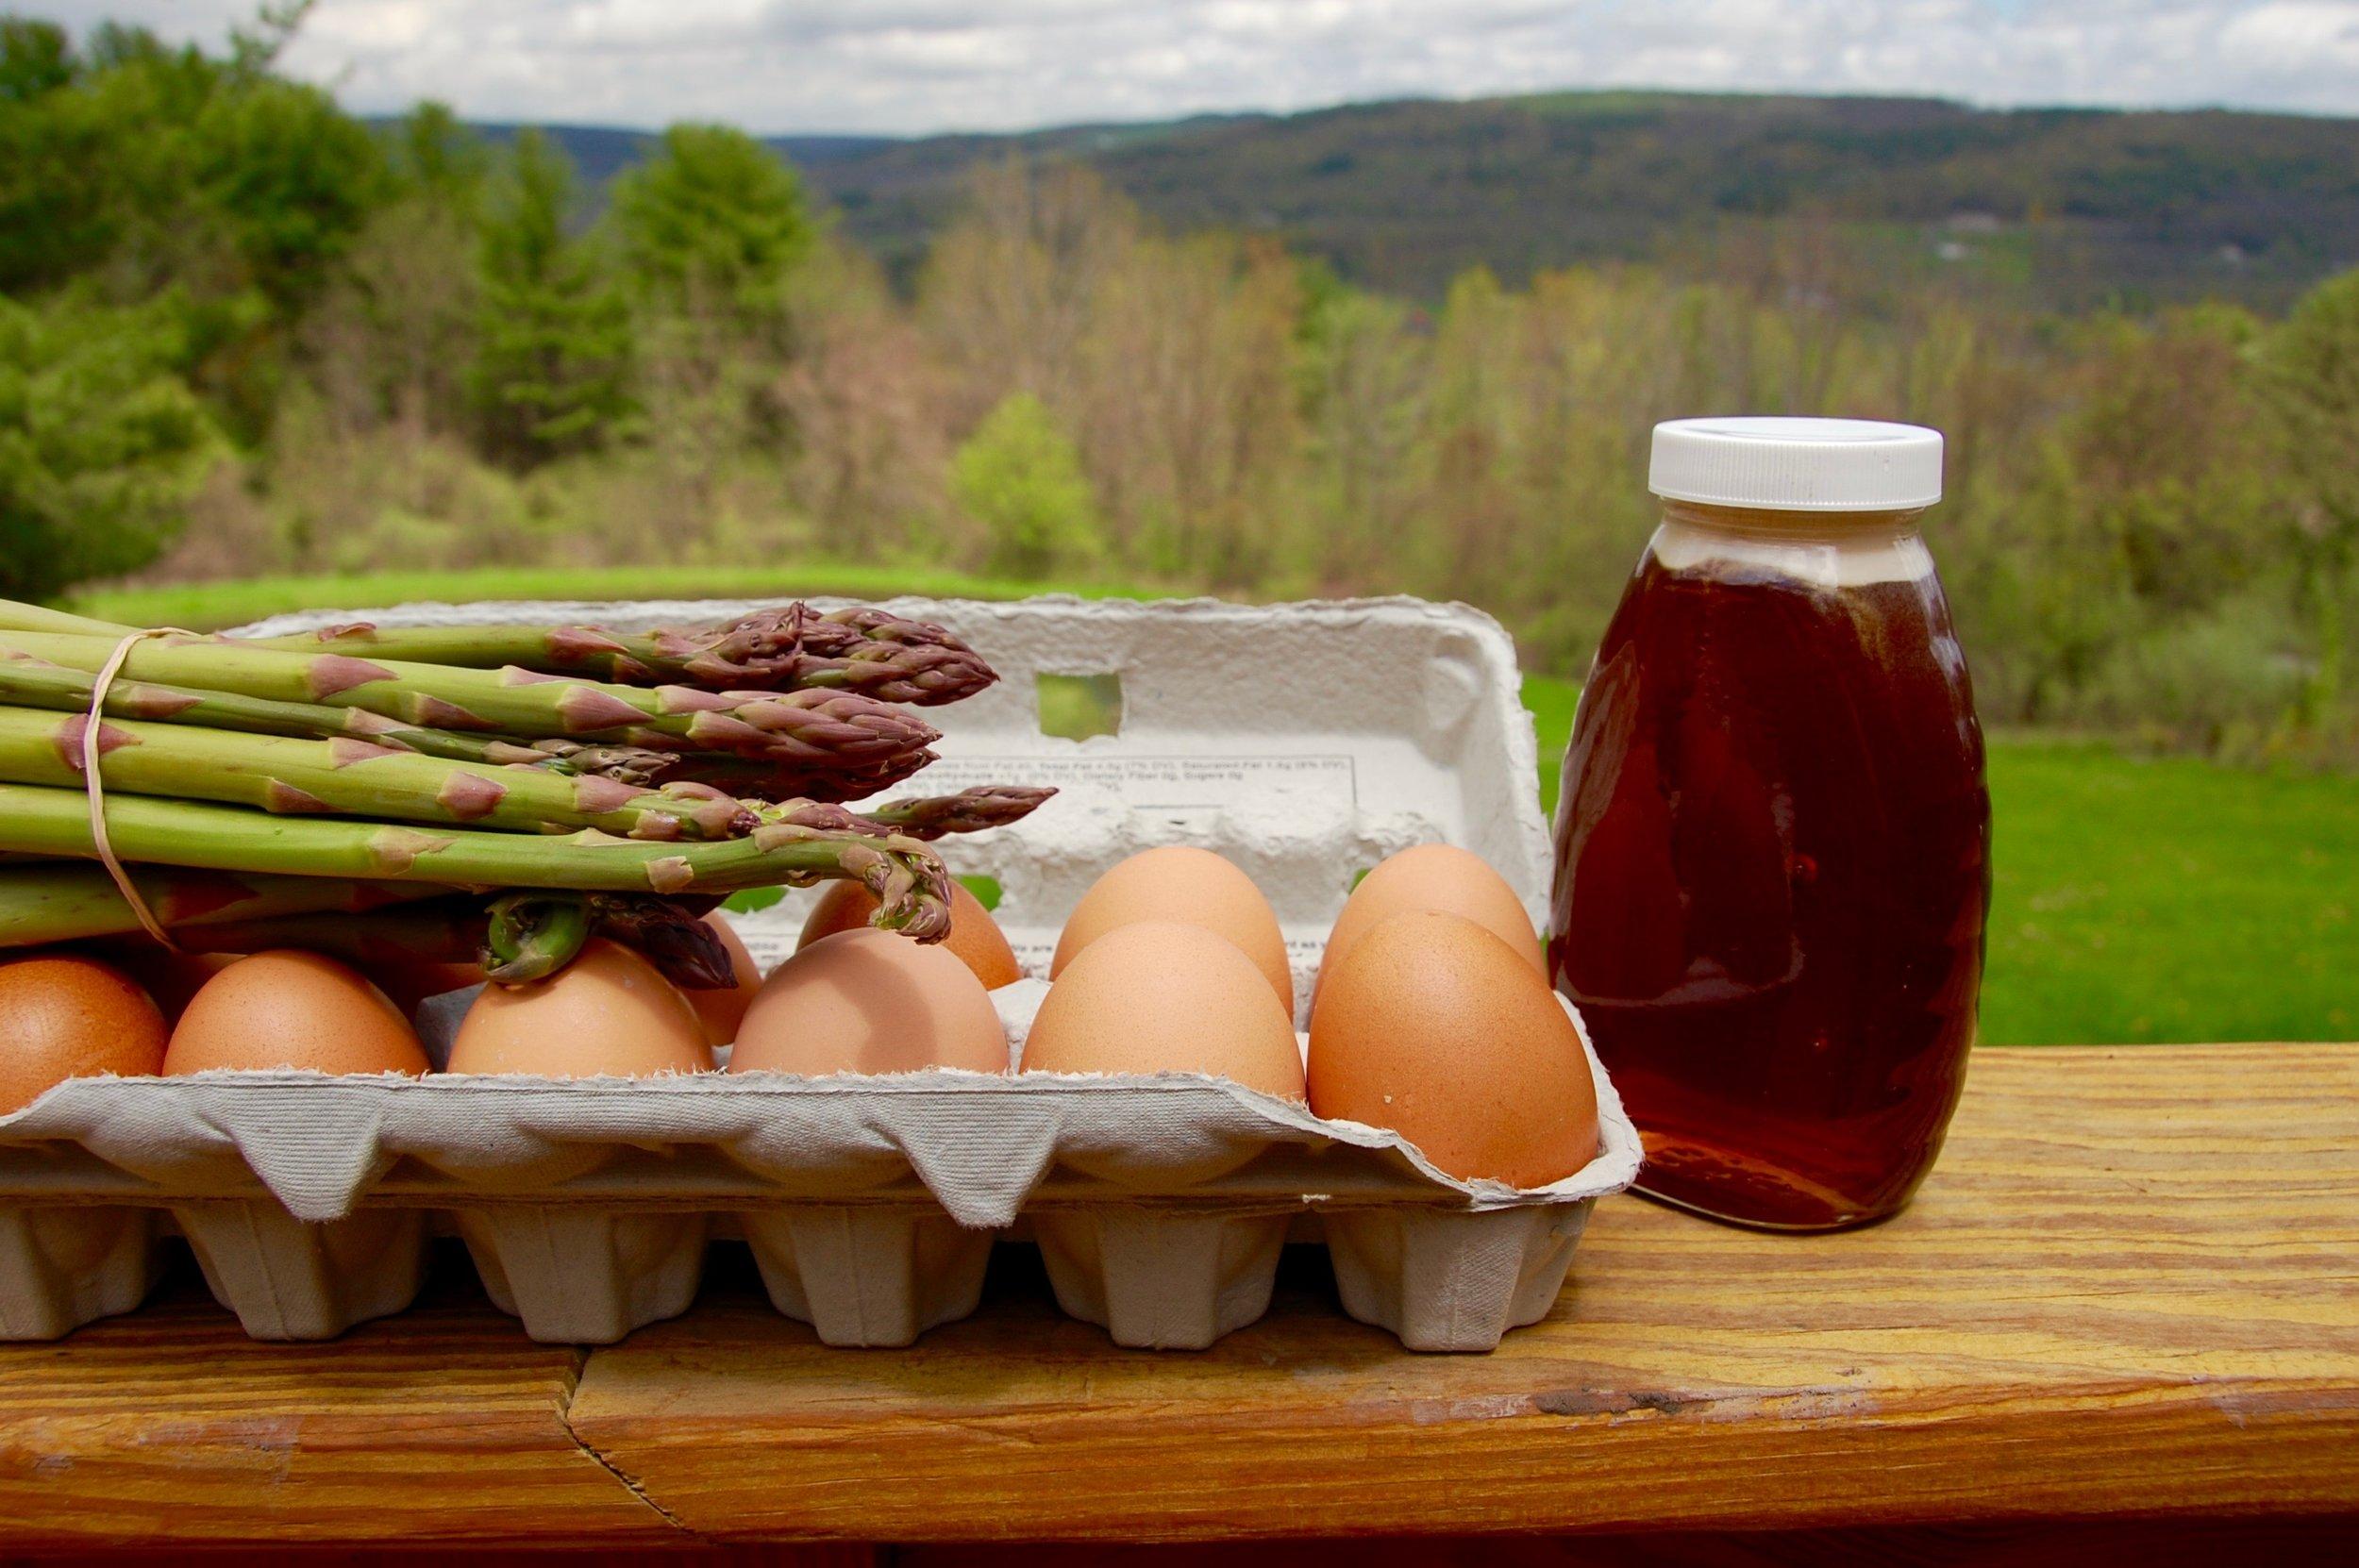 Asparagus, eggs, and honey from East Durham Farms